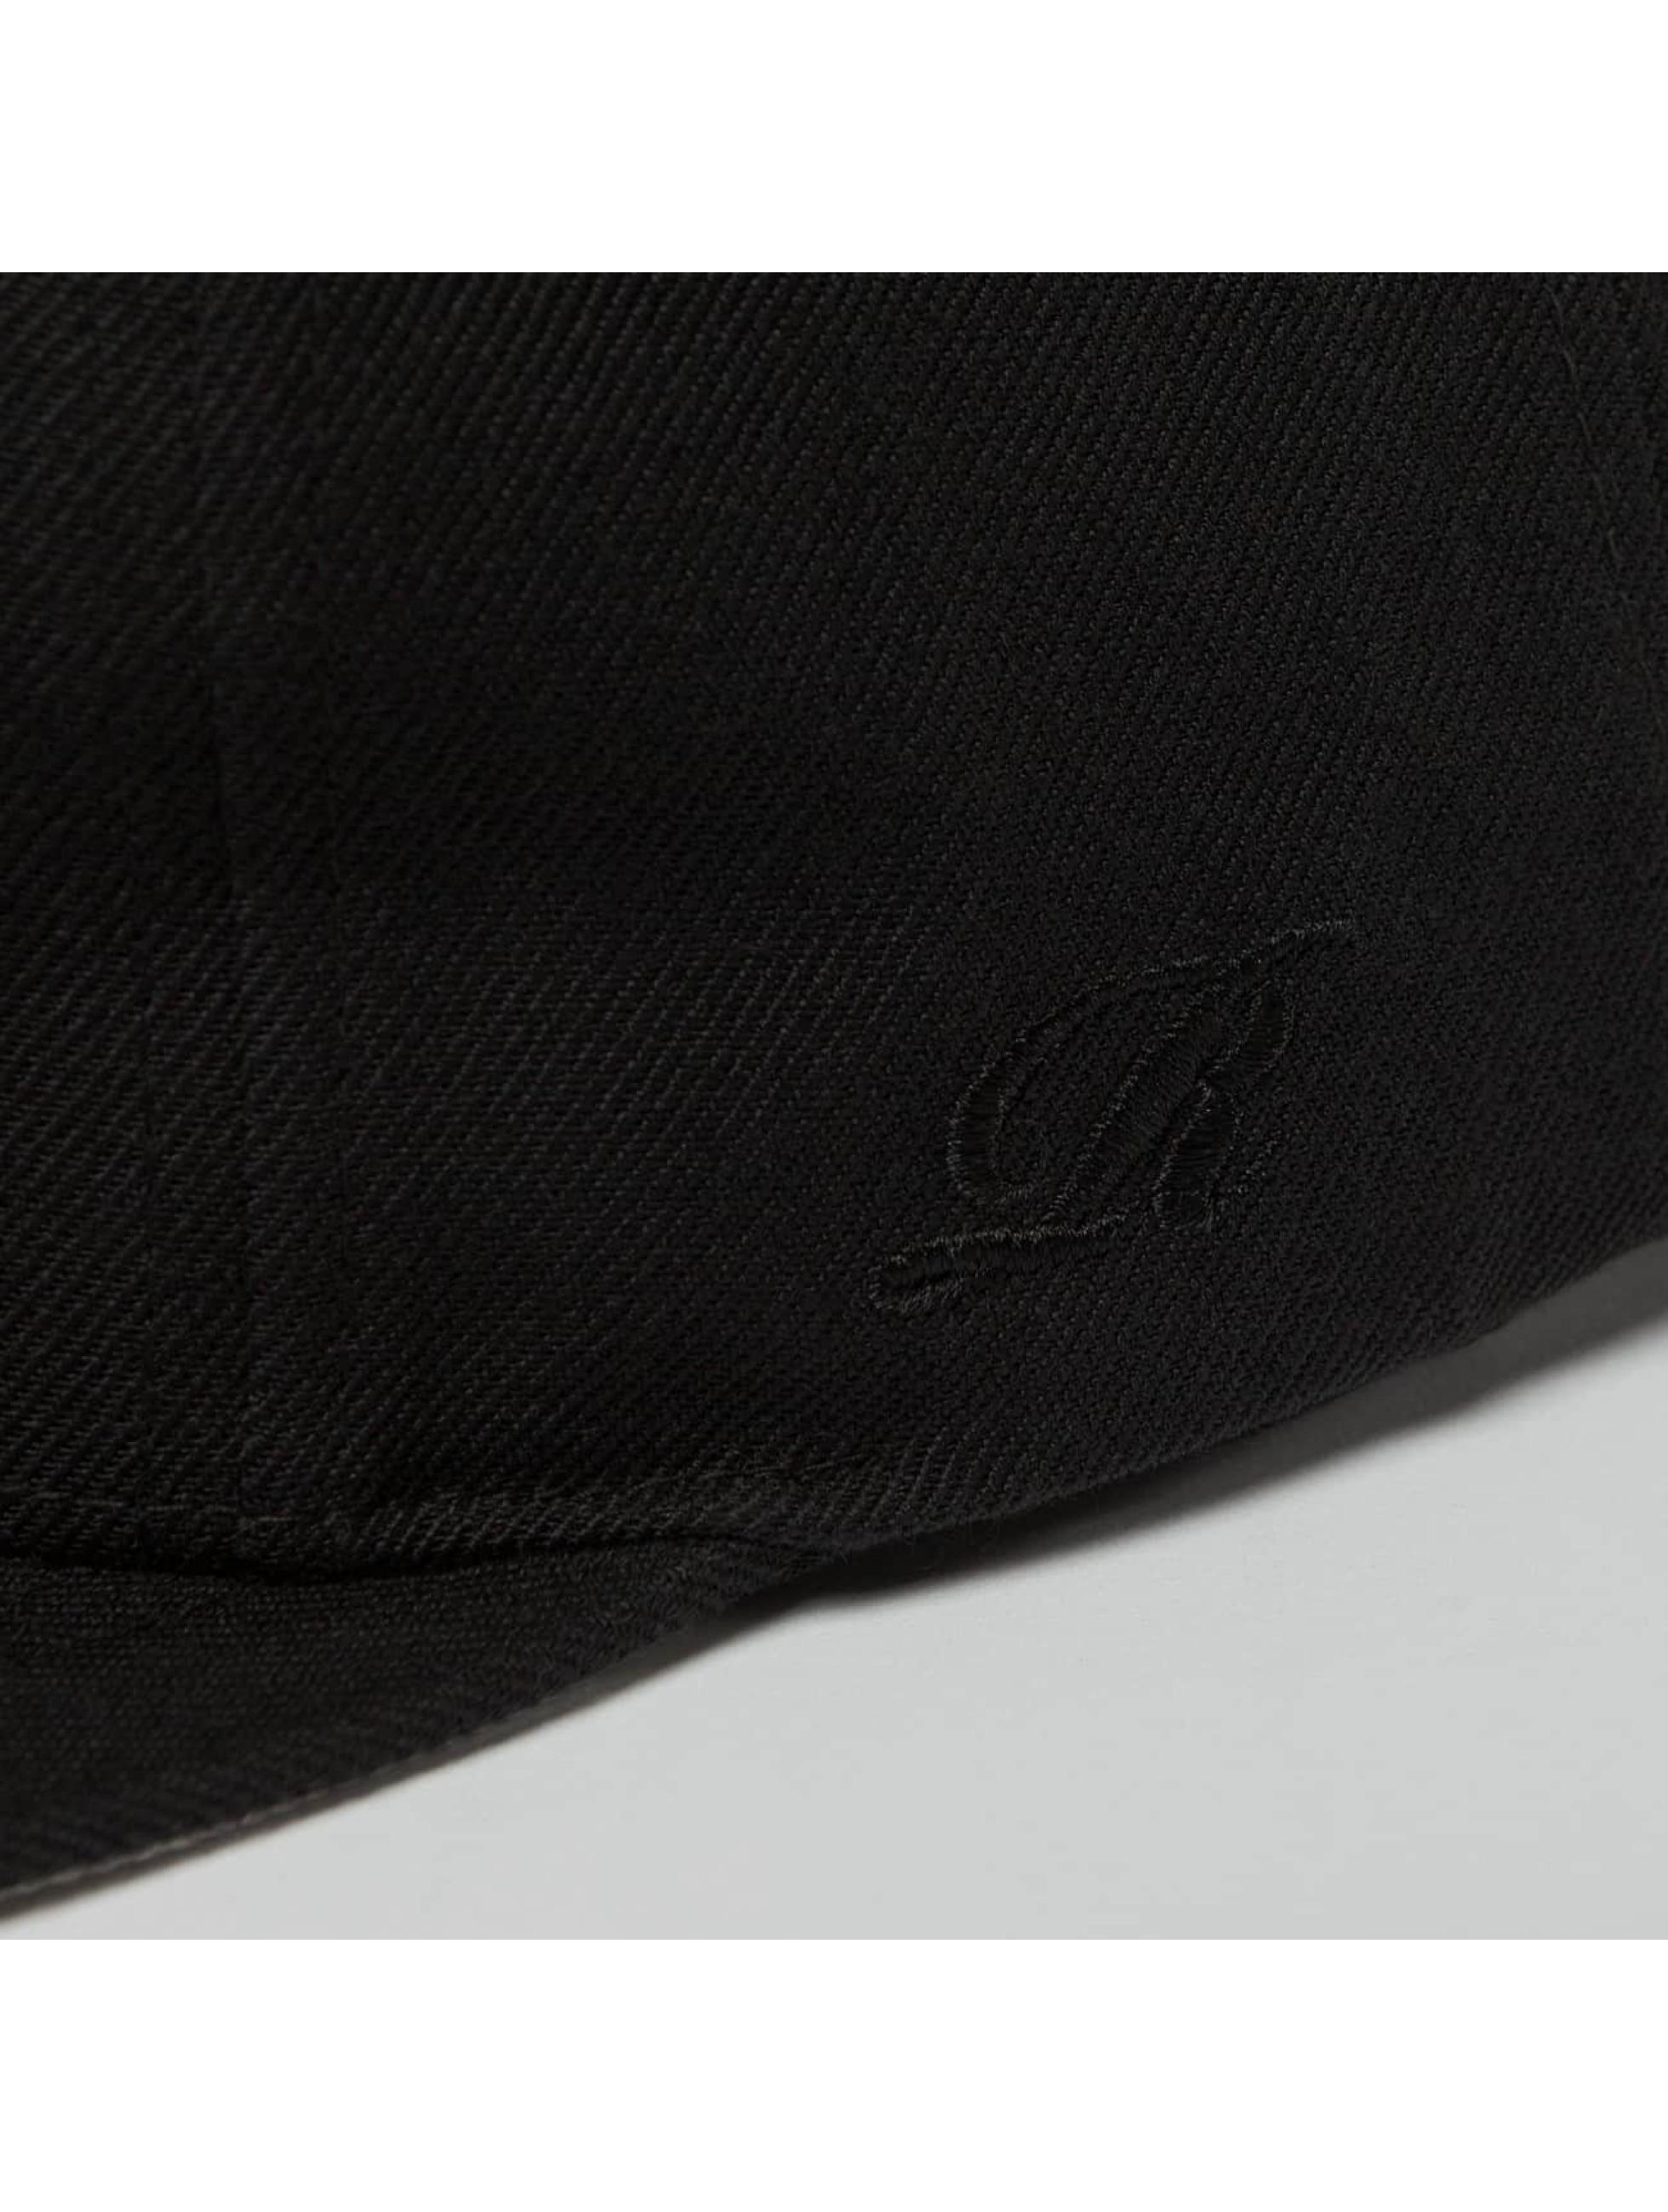 Reell Jeans Casquette Snapback & Strapback Base noir